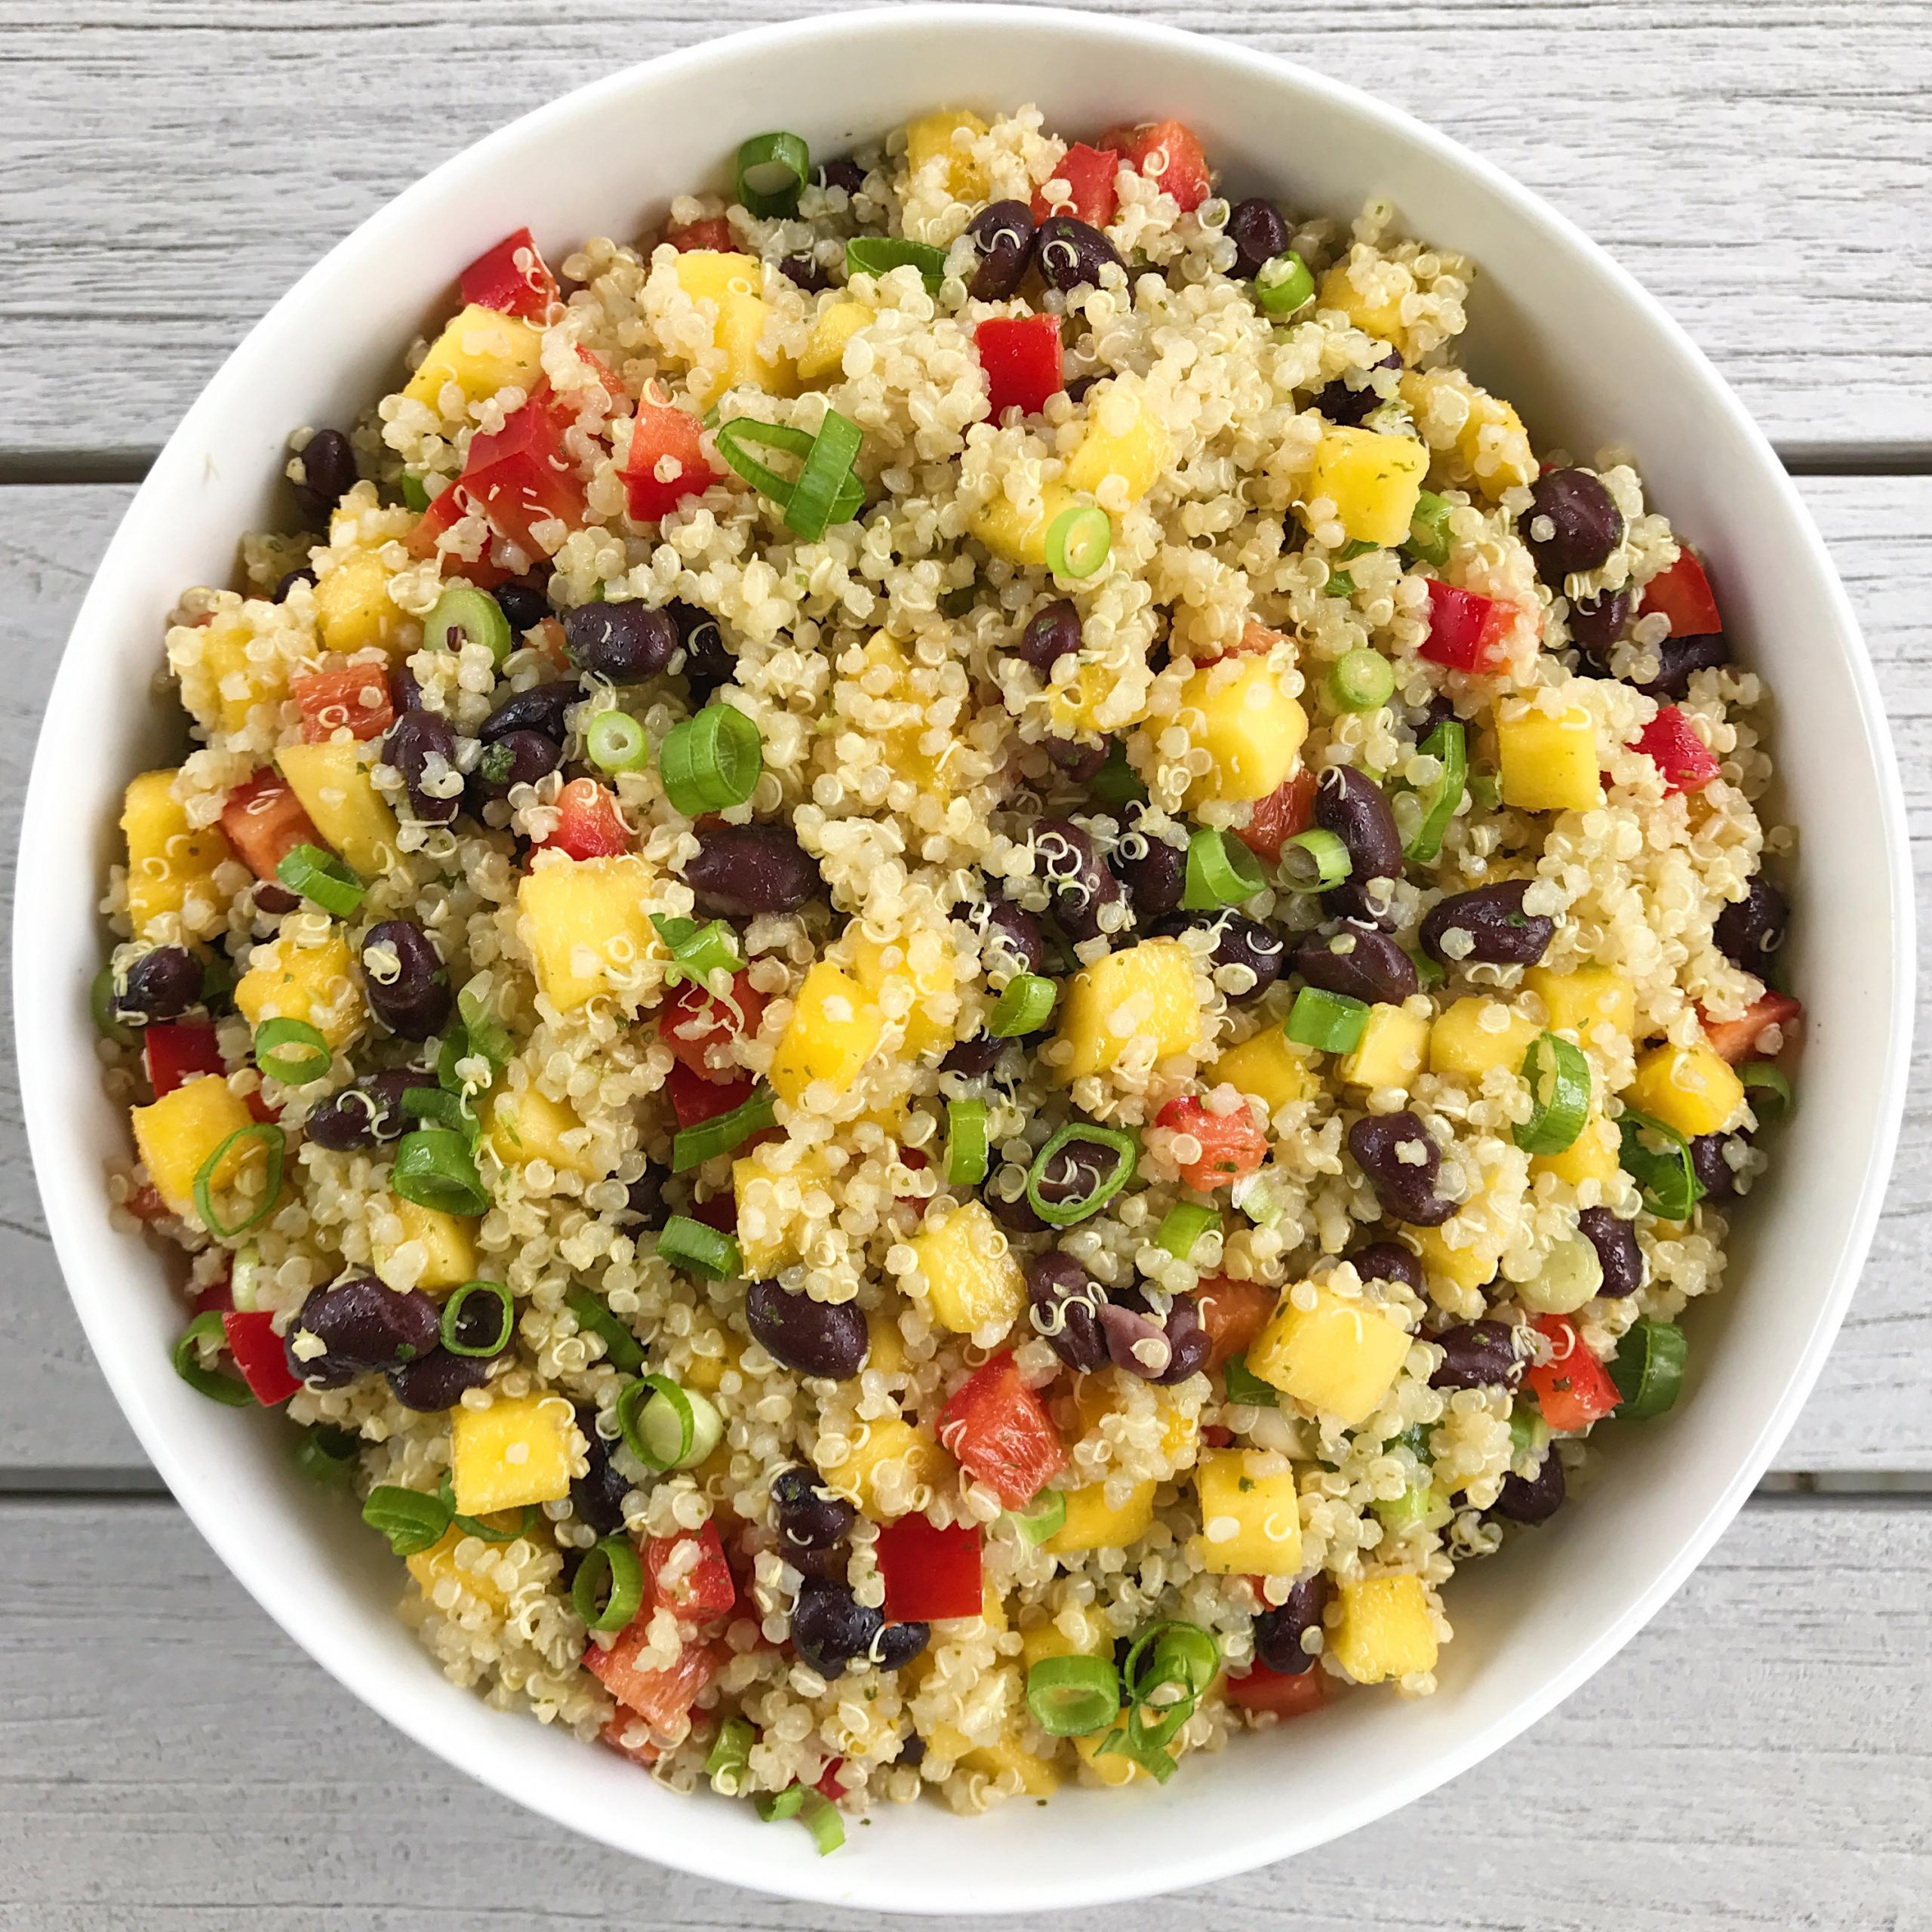 mango black bean quinoa salad gluten free #glutenfreerecipes www.healthygffamily.com